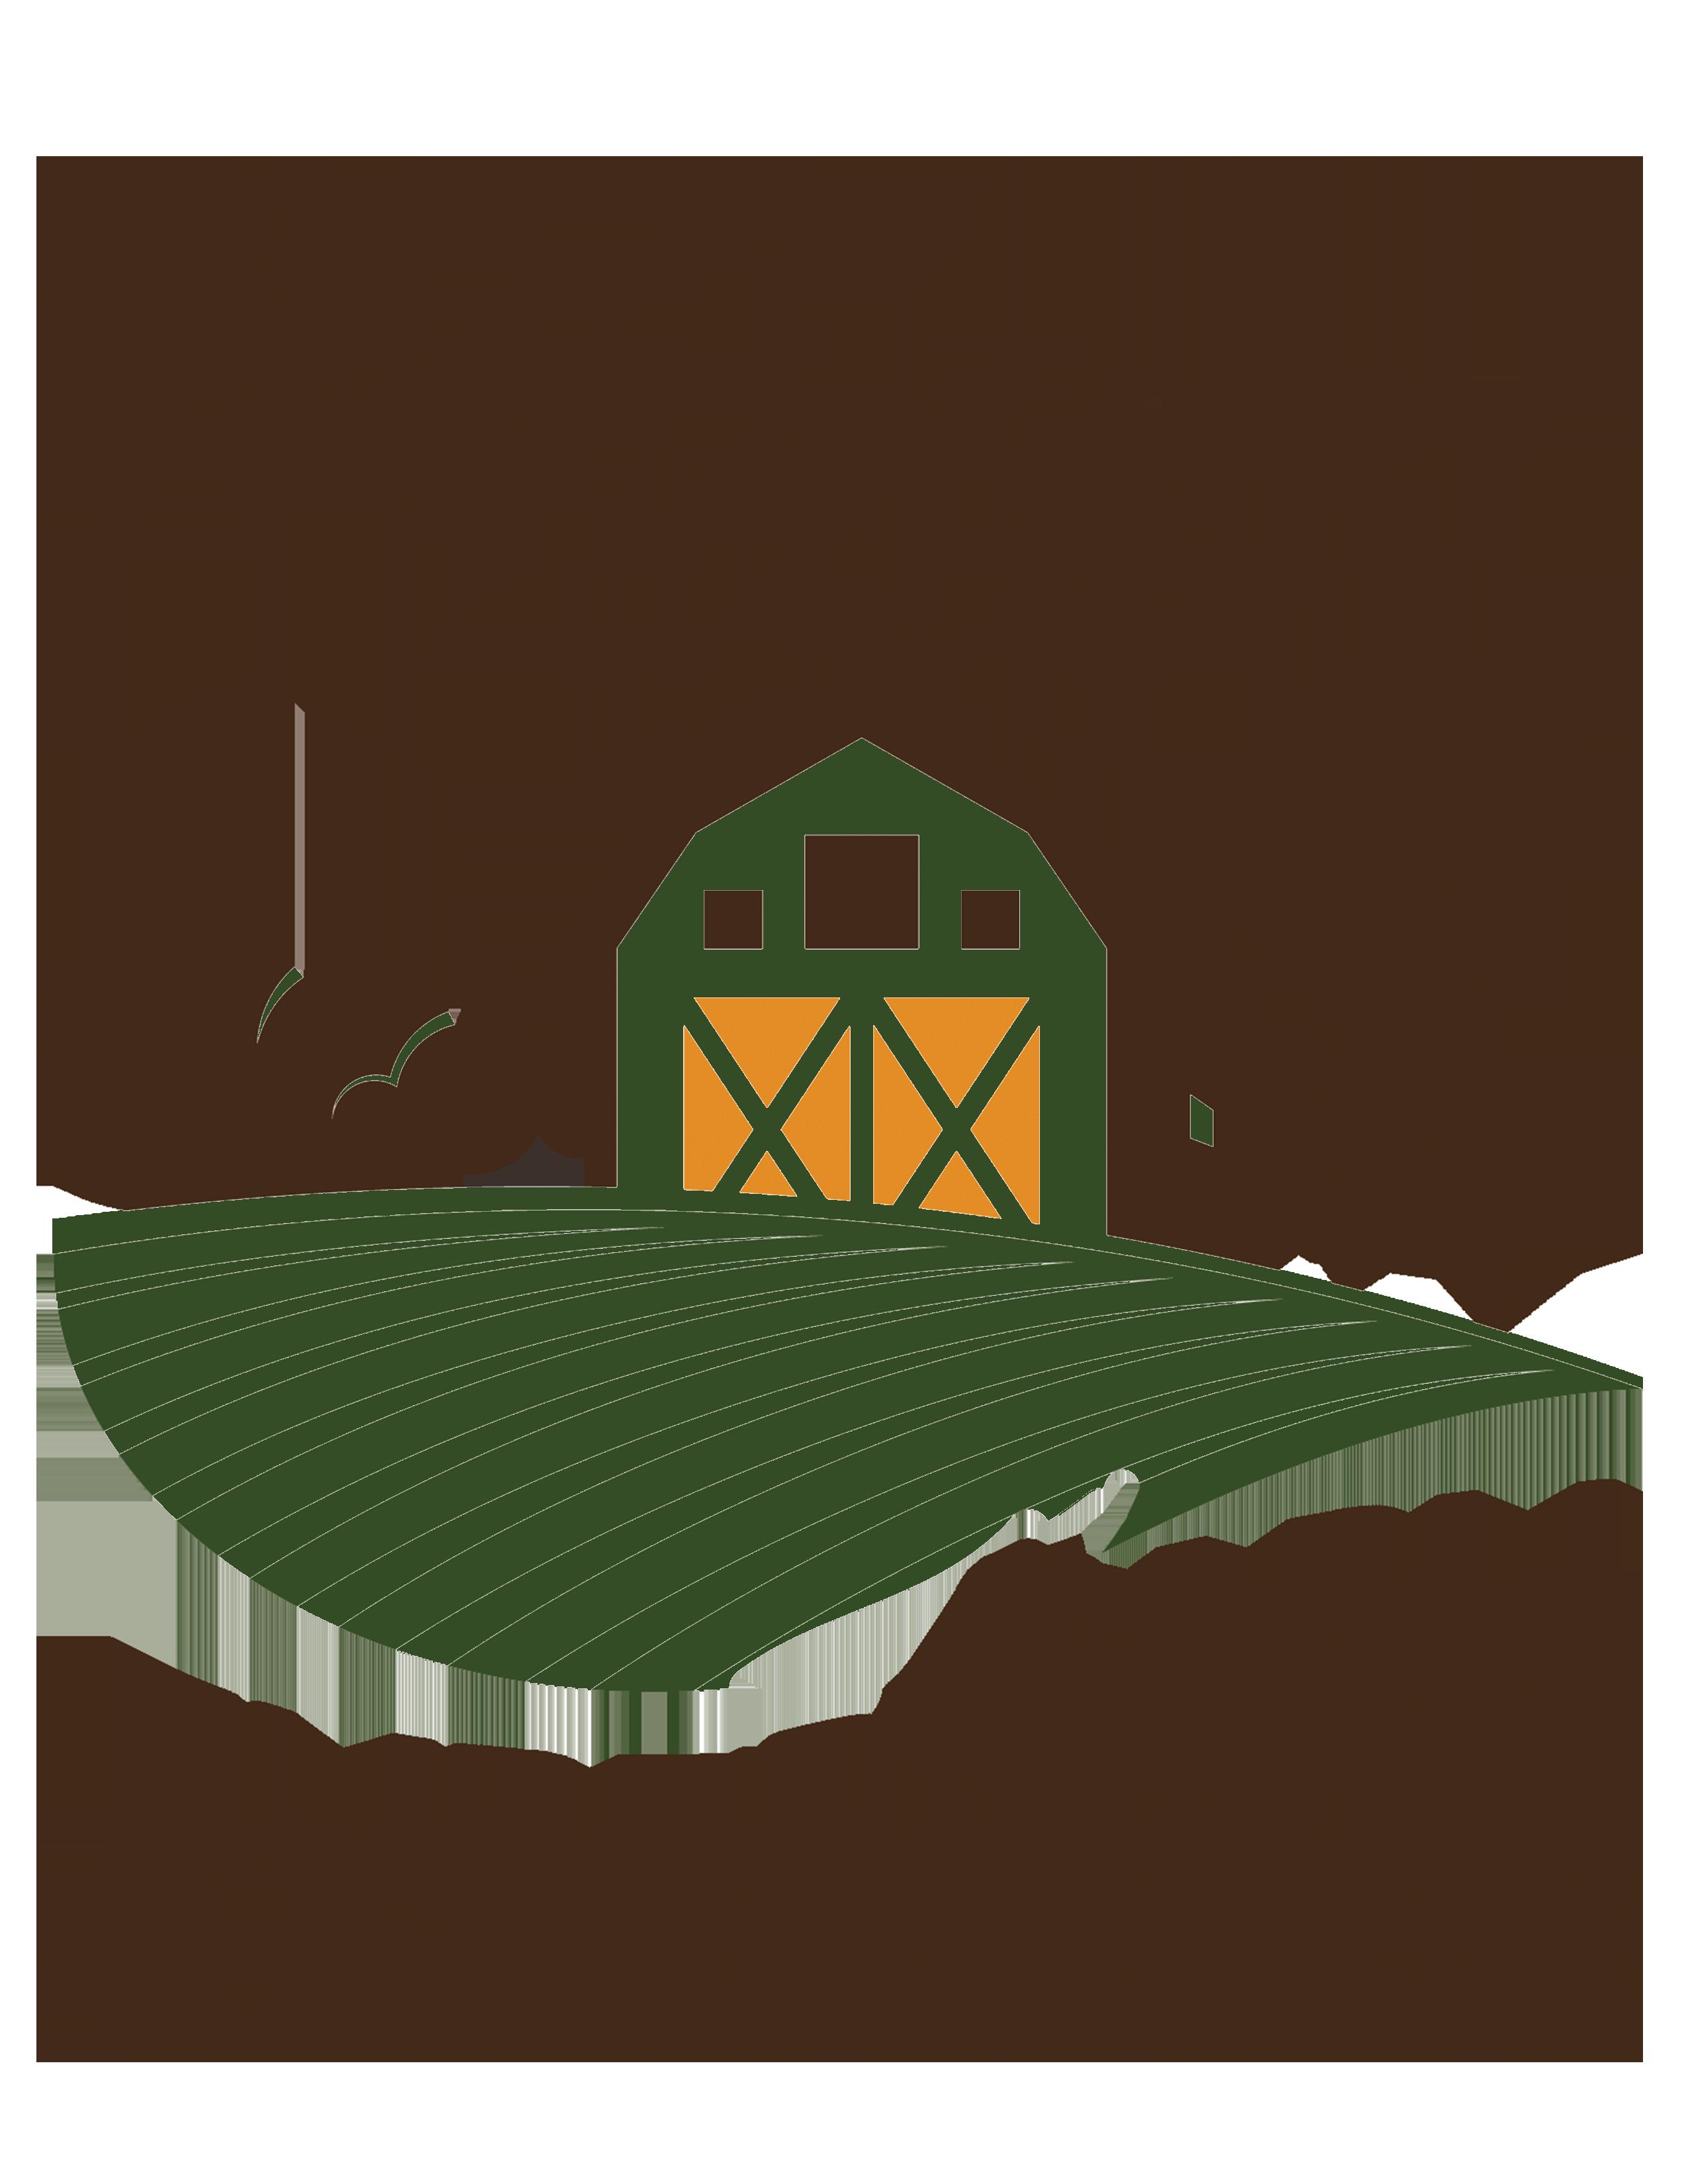 McGuigan Farm Experience